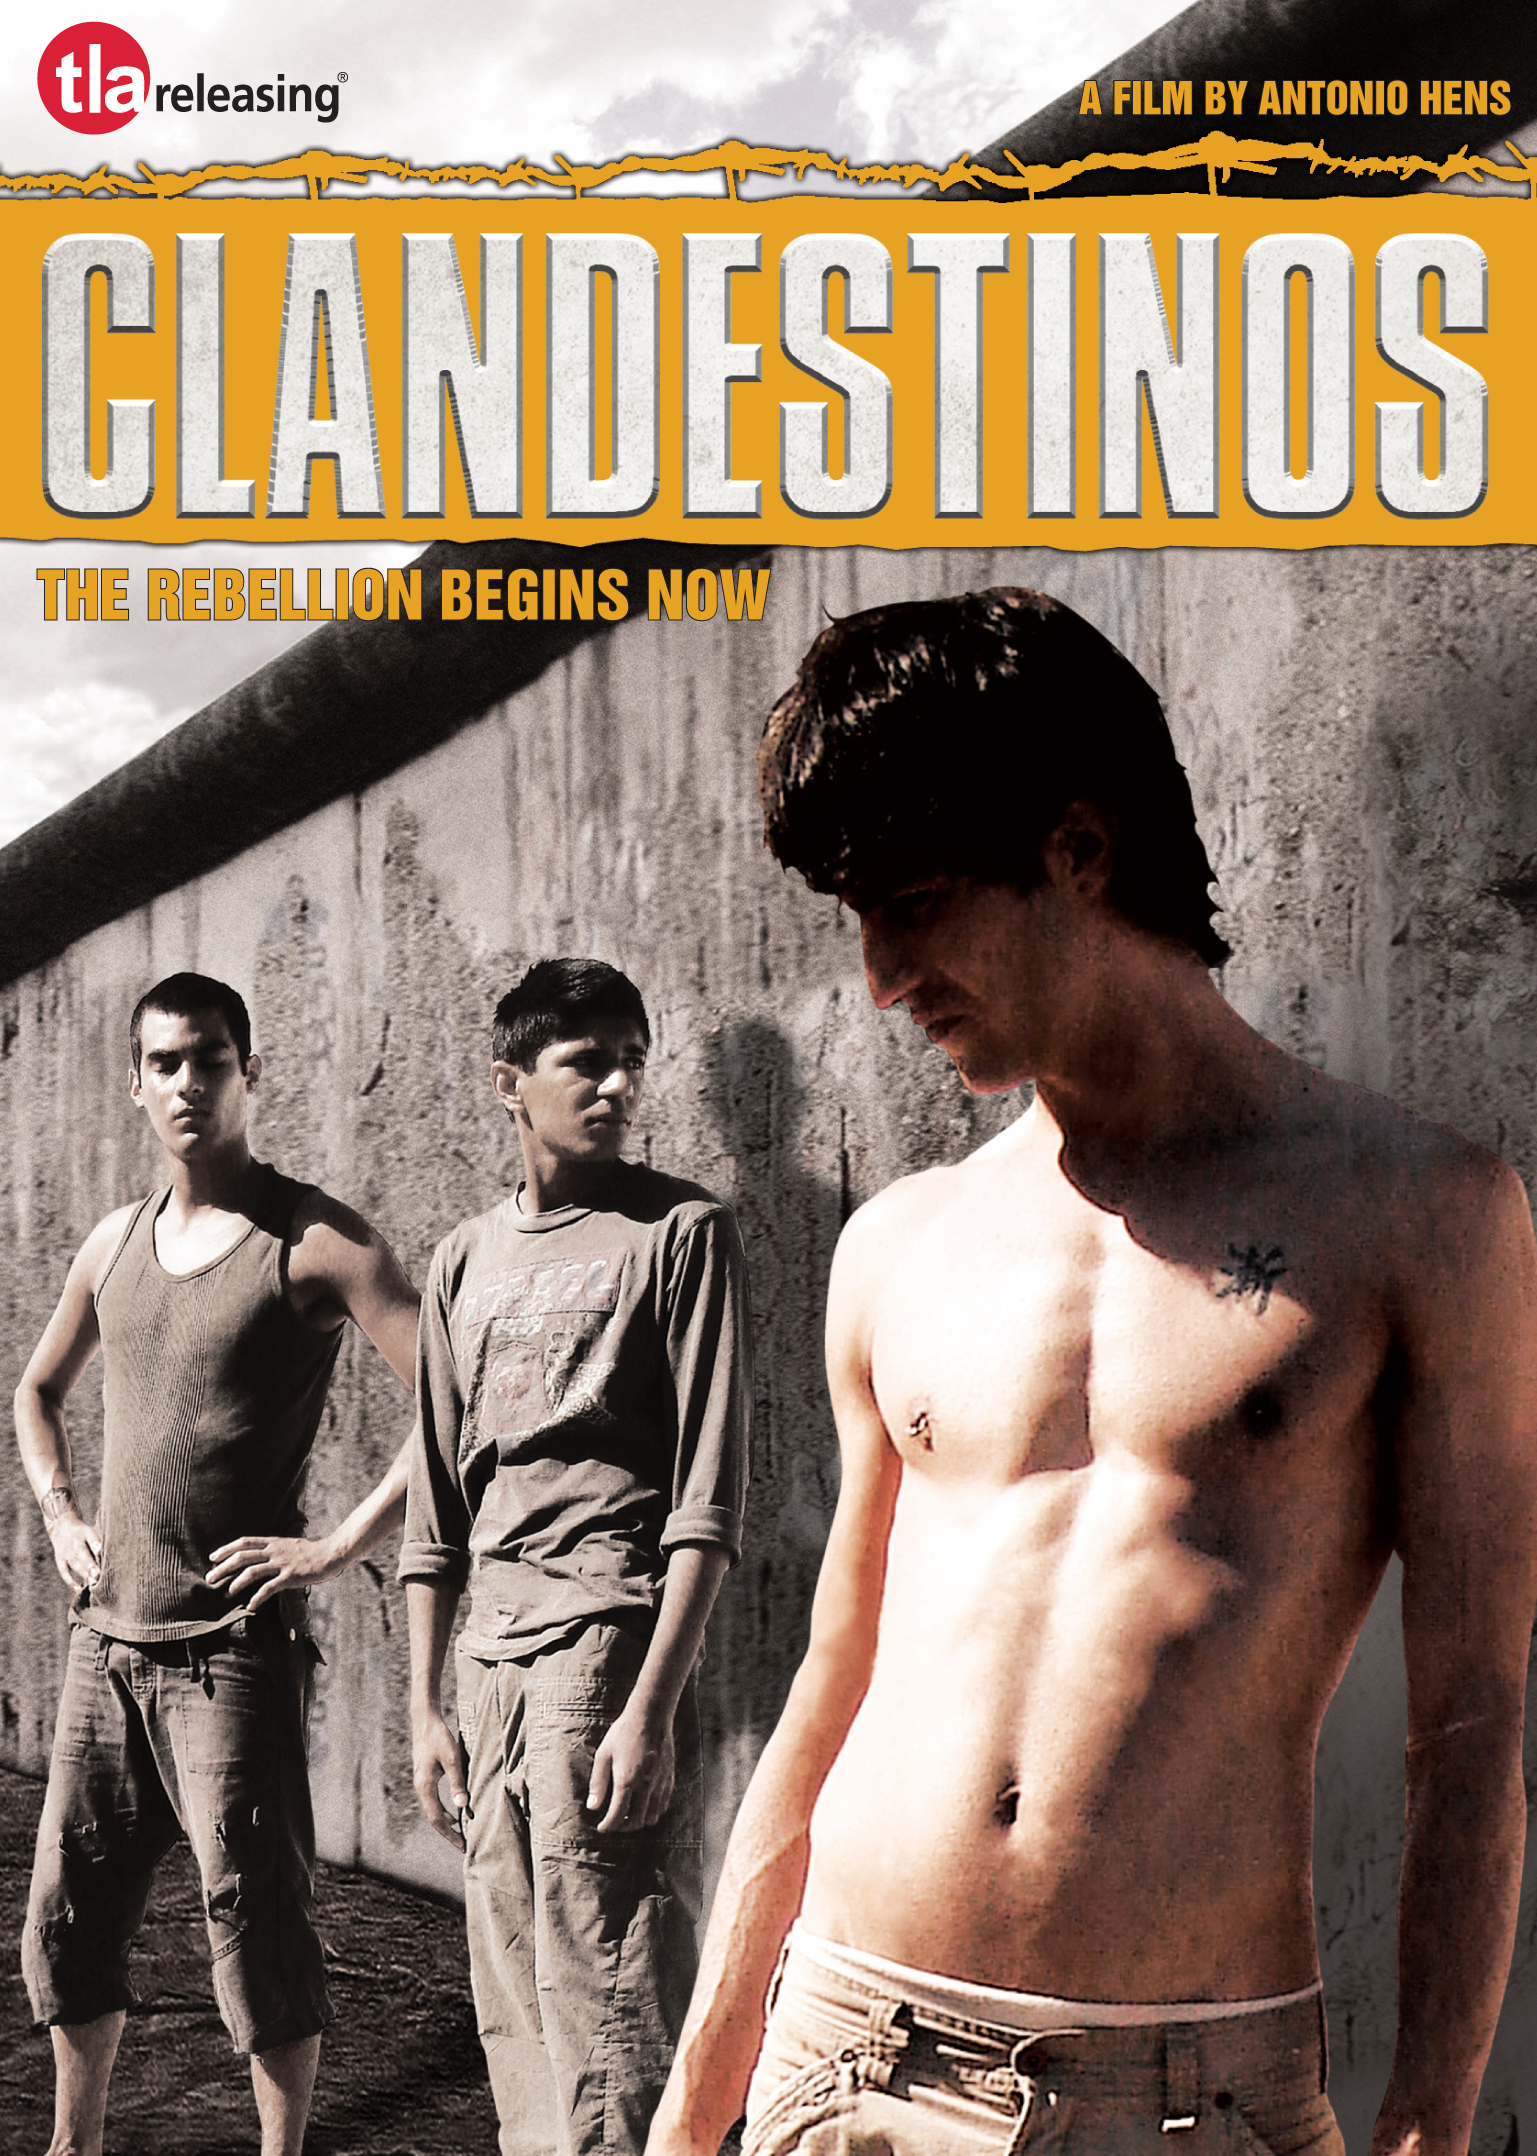 Israel Rodríguez, Hugo Catalán, and Mehroz Arif in Clandestinos (2007)